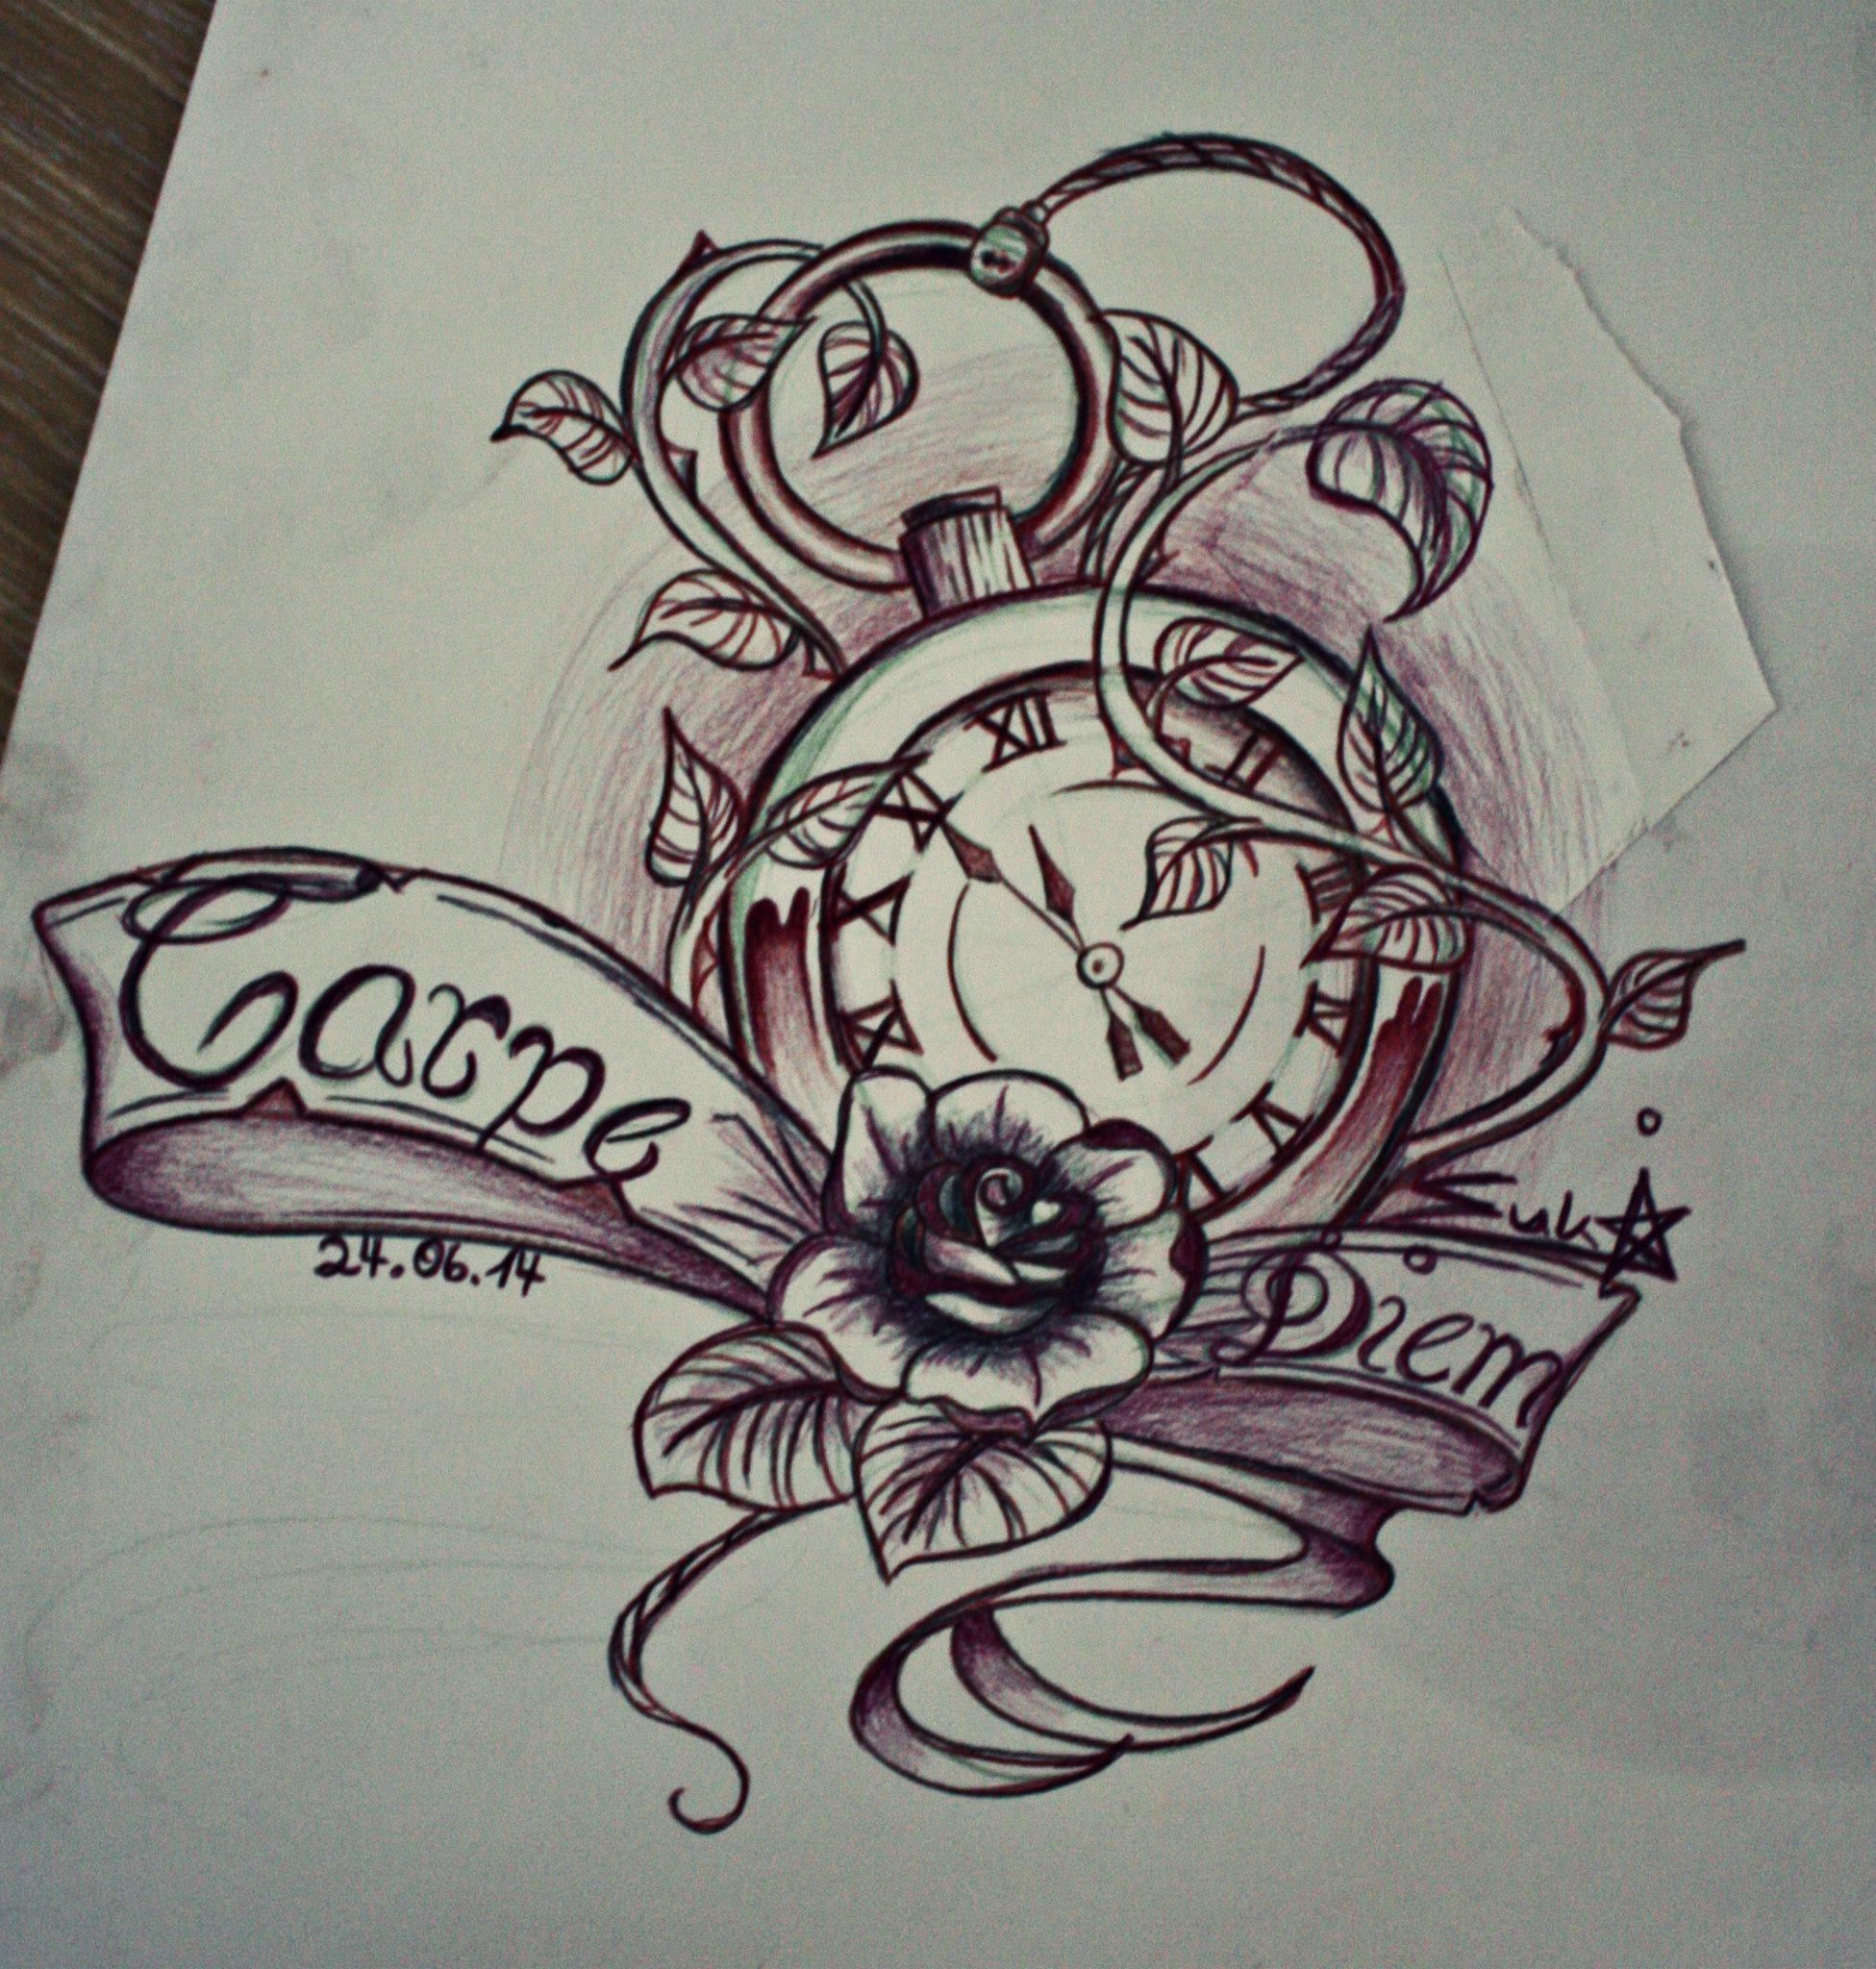 Carpe Diem Tattoo Design By Sukis Brain Artwork On DeviantArt